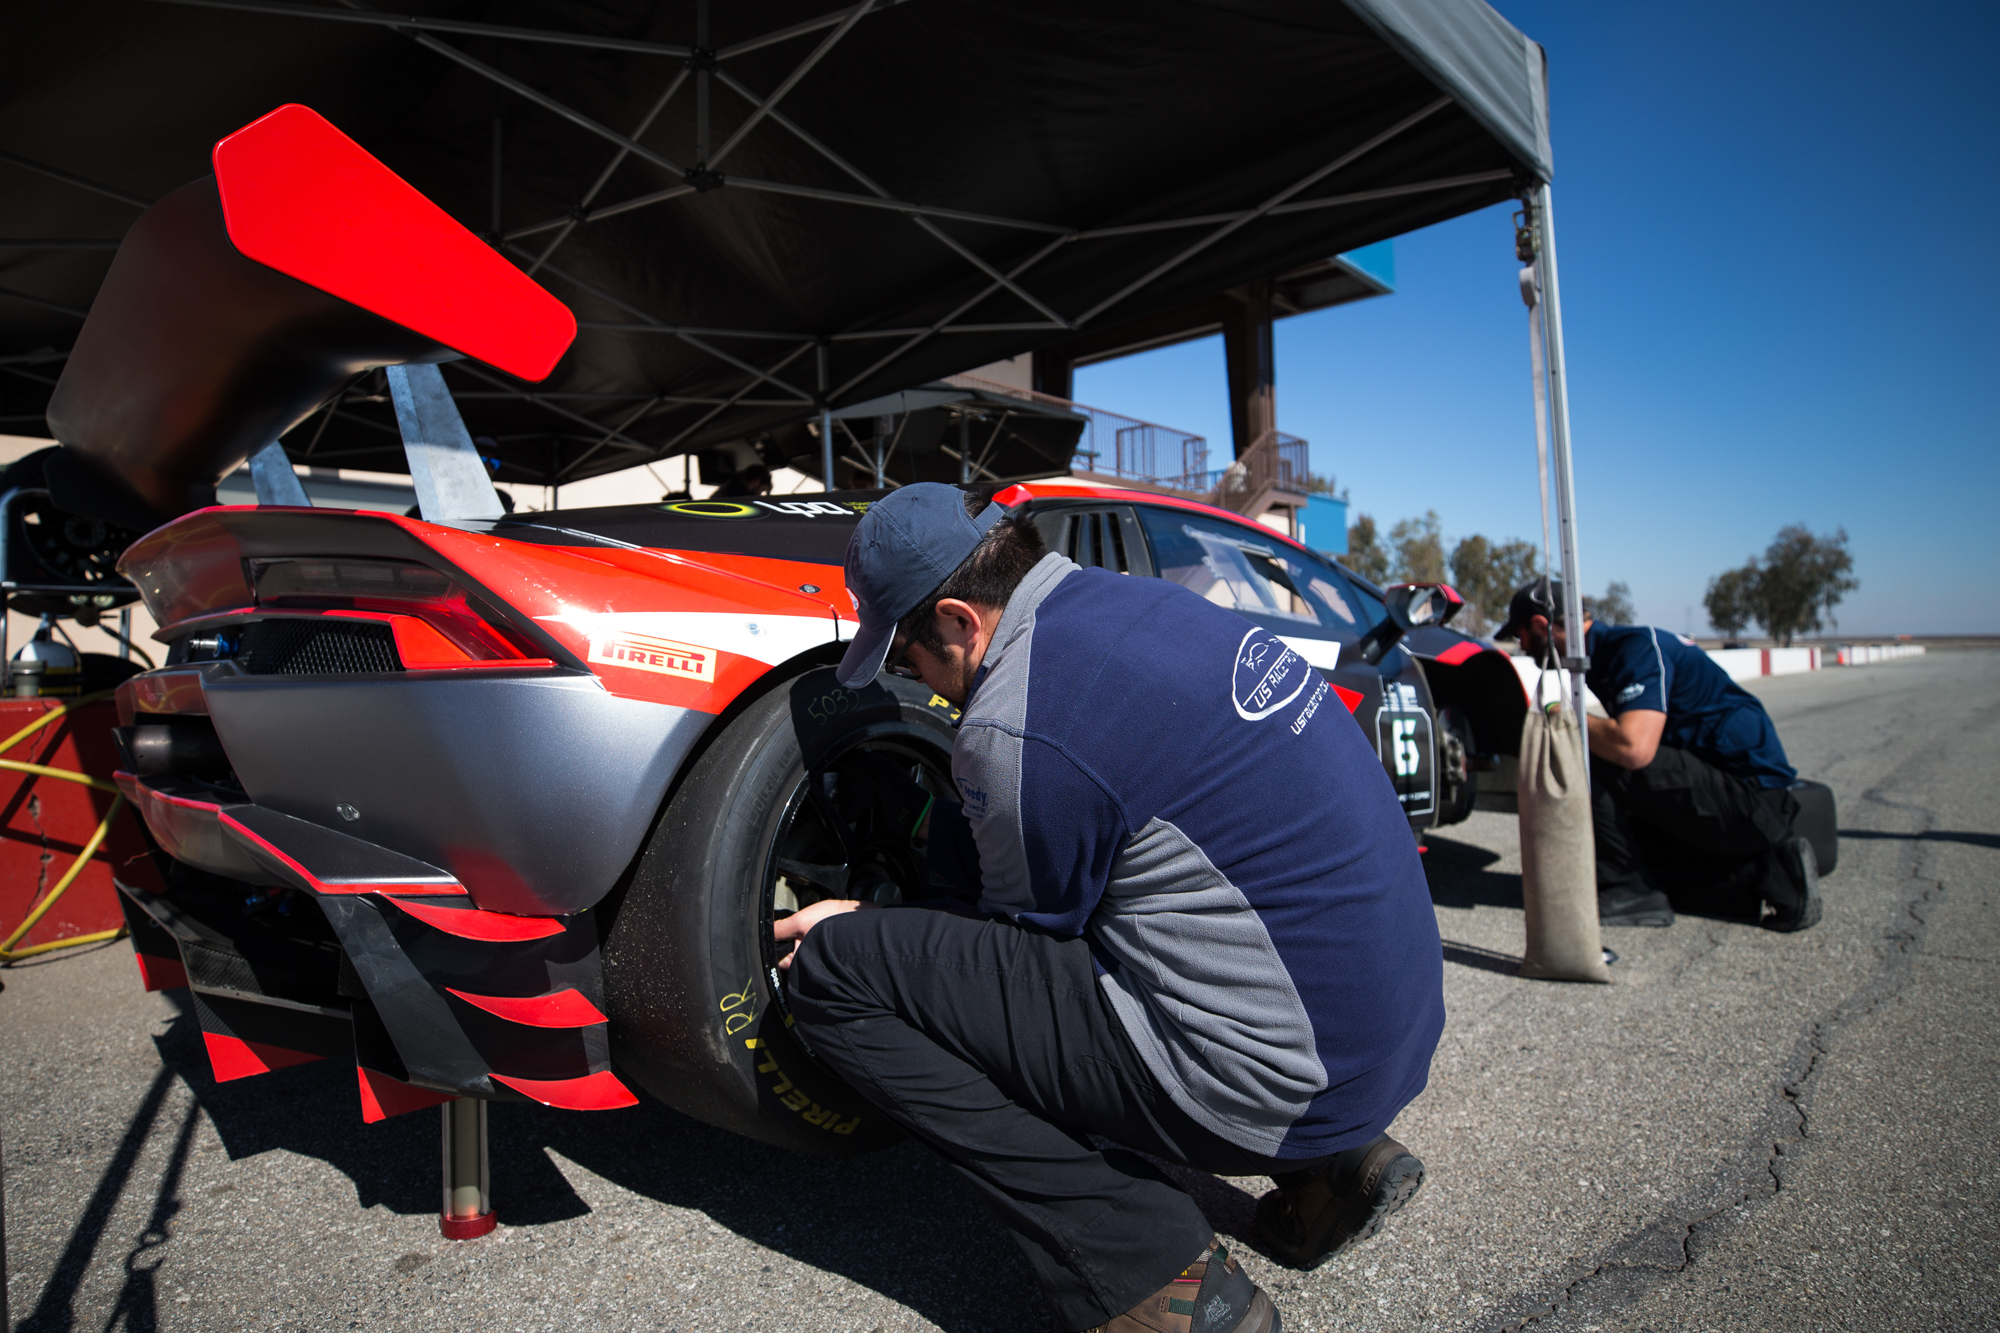 Steven-Racing-20180221-73270.jpg